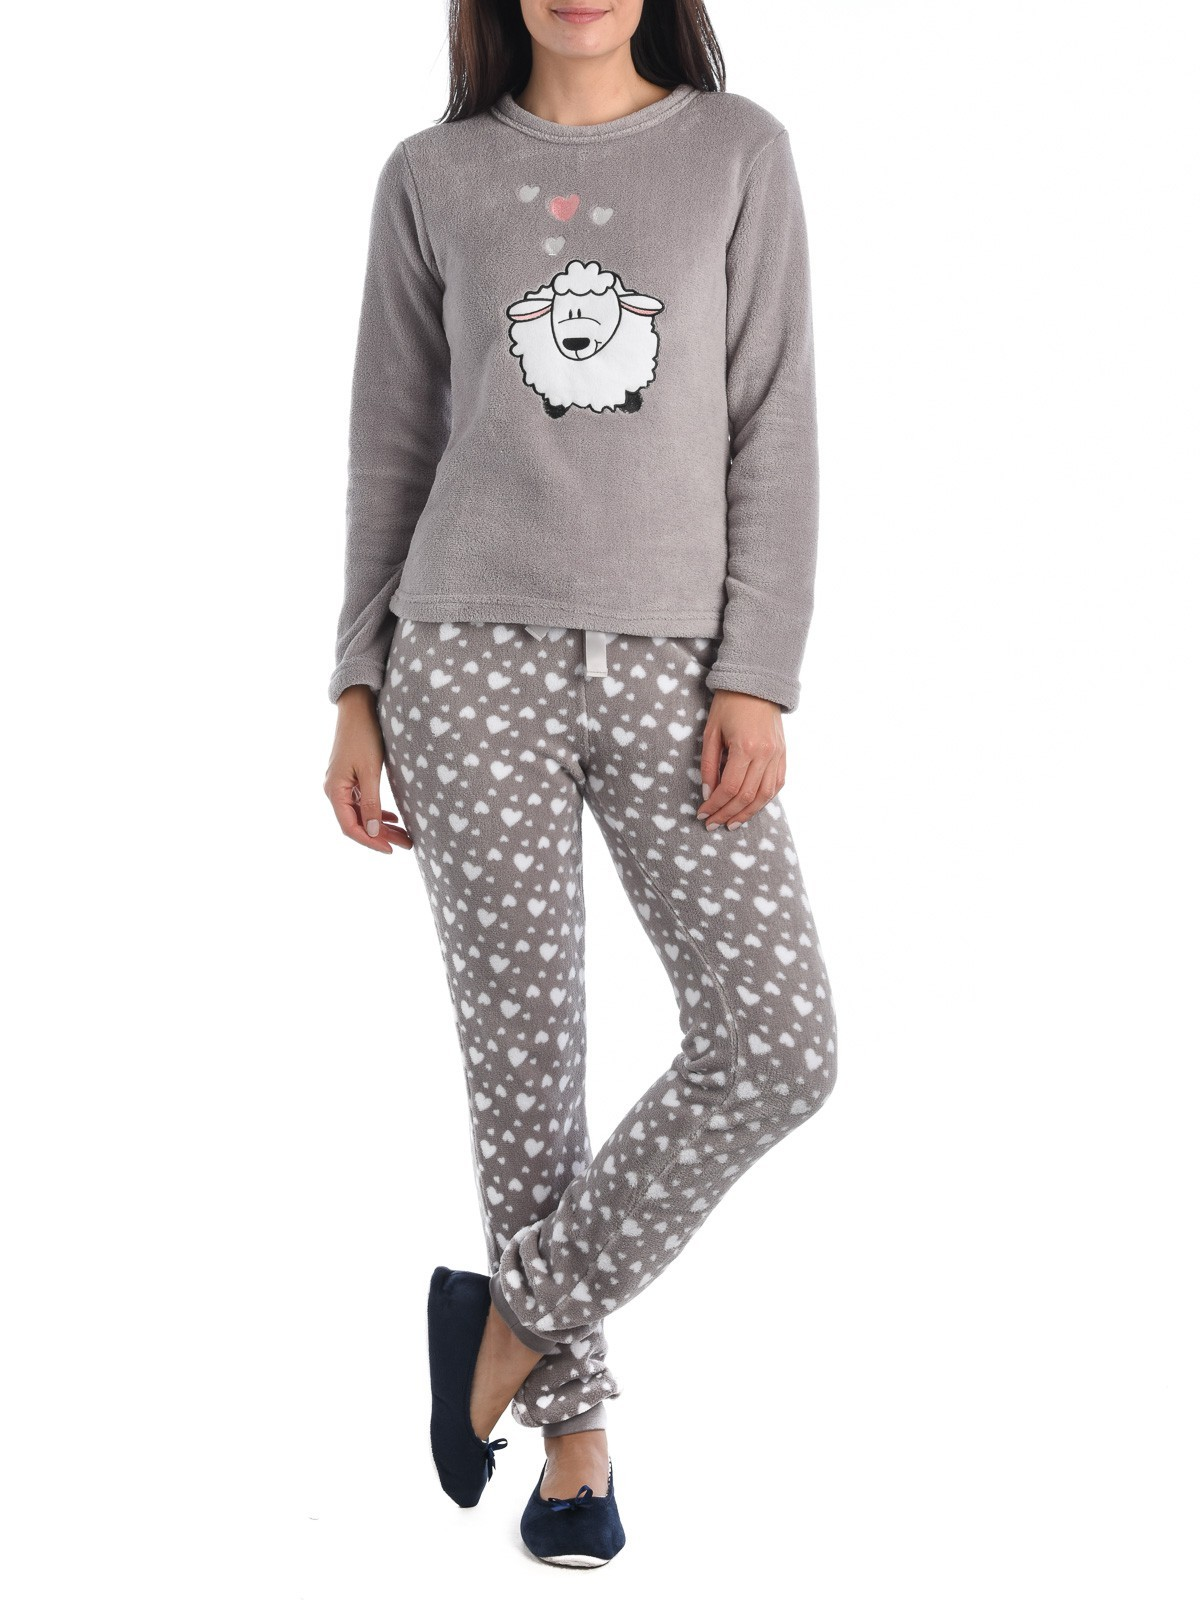 aa02a2400007b Pyjama polaire femme - DistriCenter